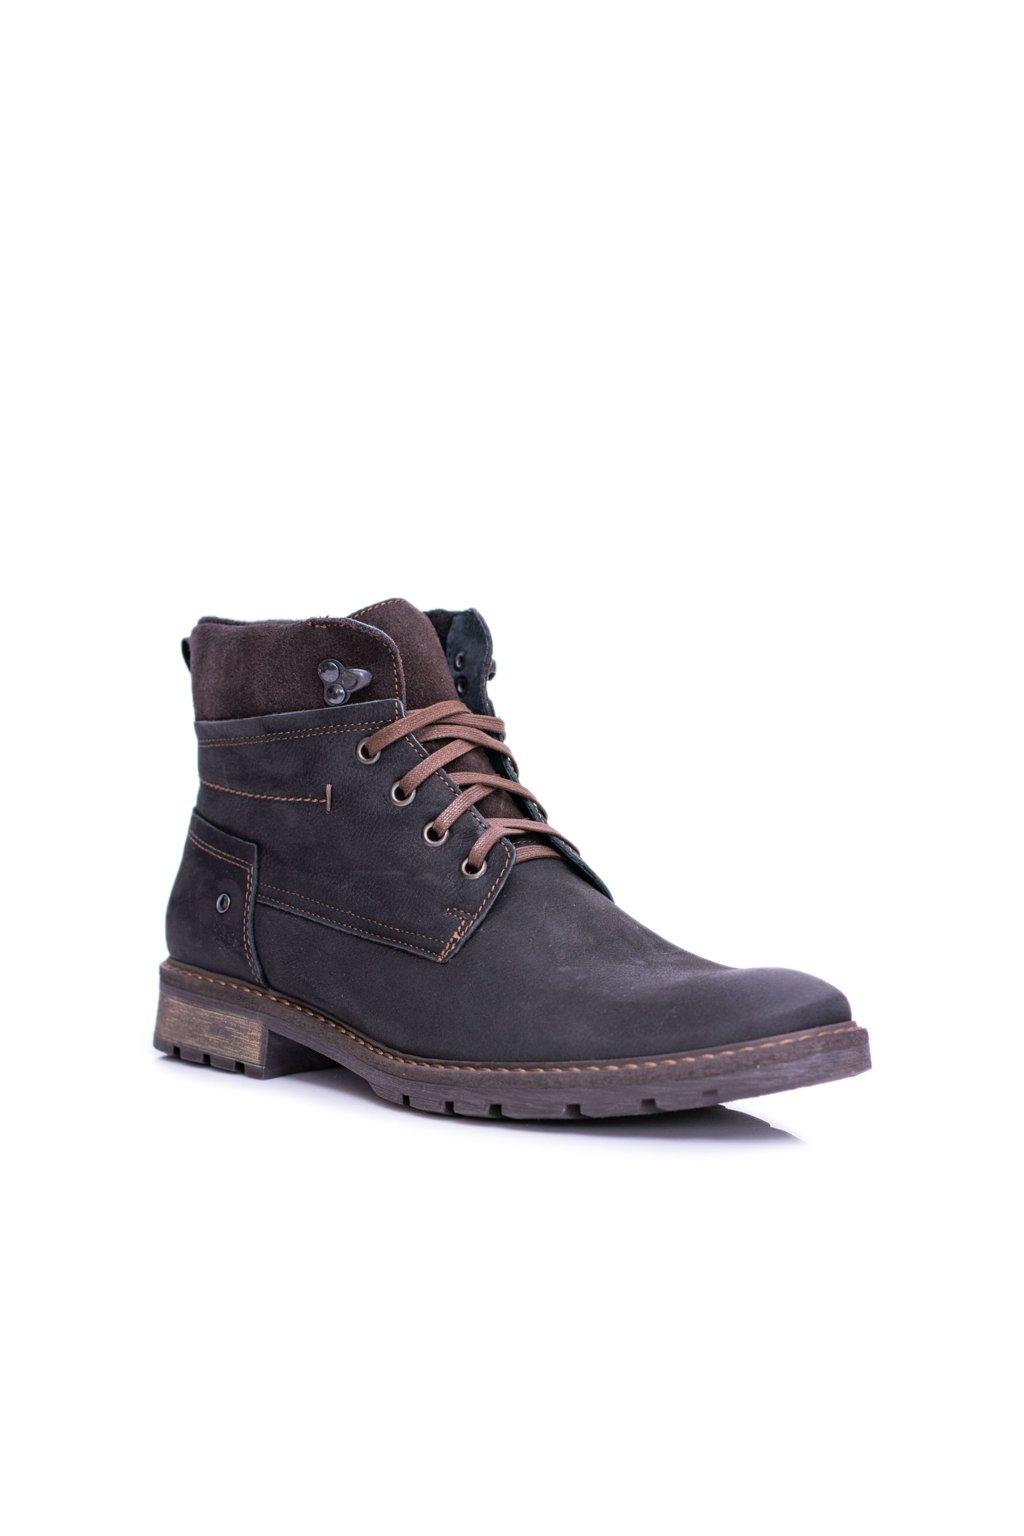 Čierne kožené panské hrejivé vysoké topánky Neex Kobe